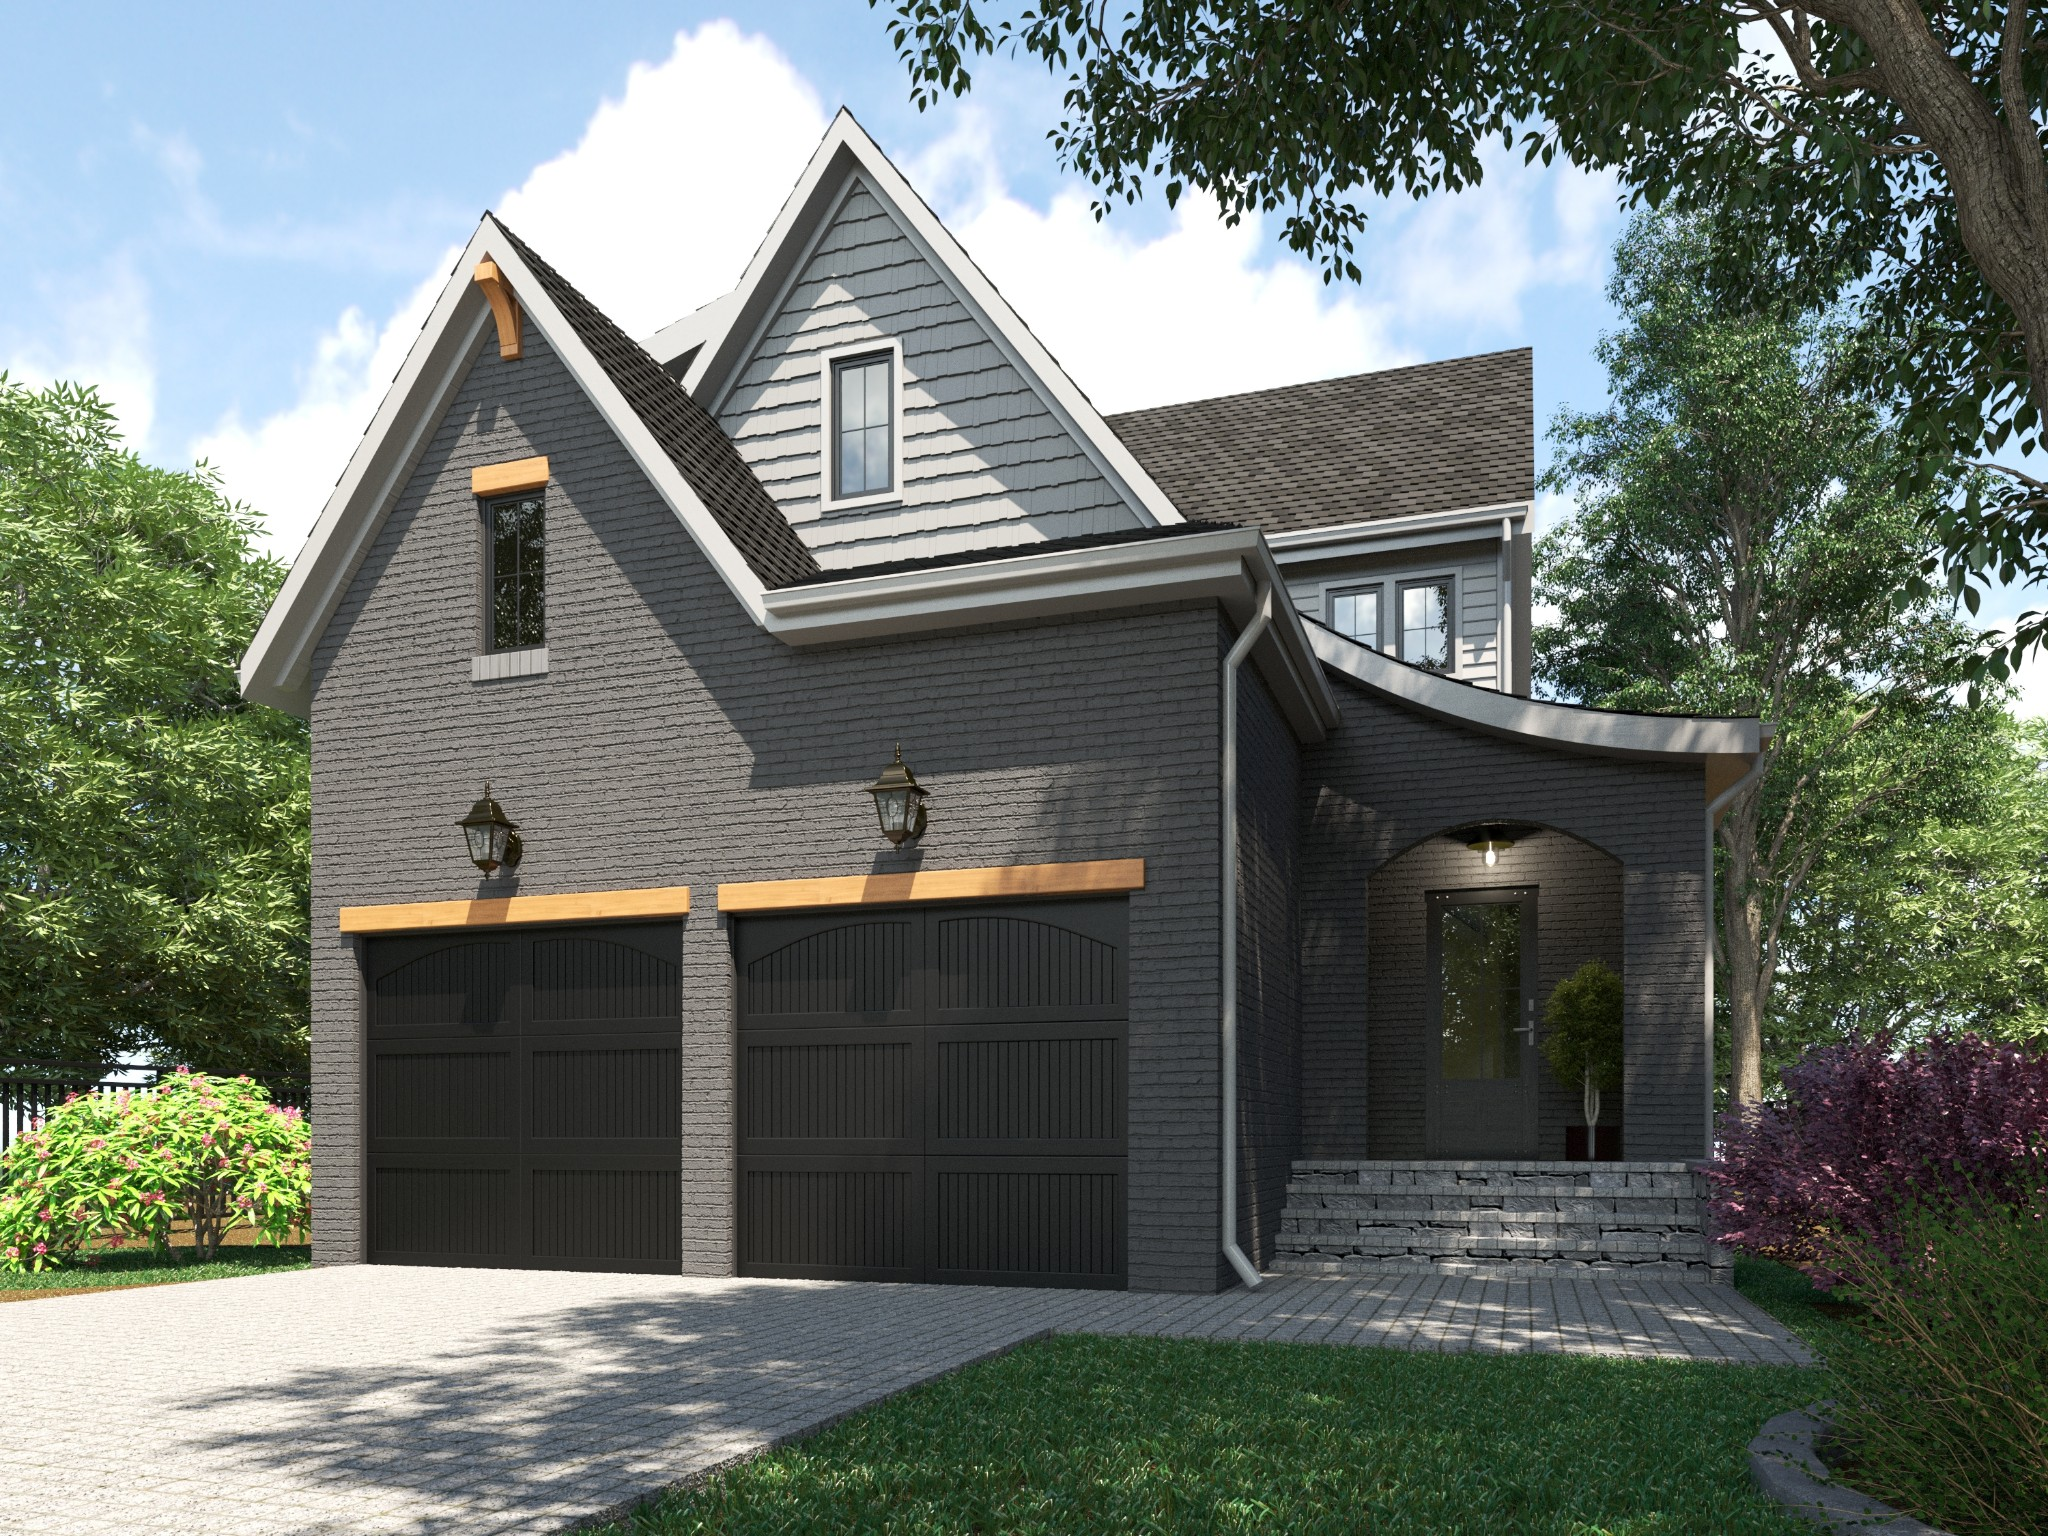 4018A Woodmont Blvd. Property Photo - Nashville, TN real estate listing